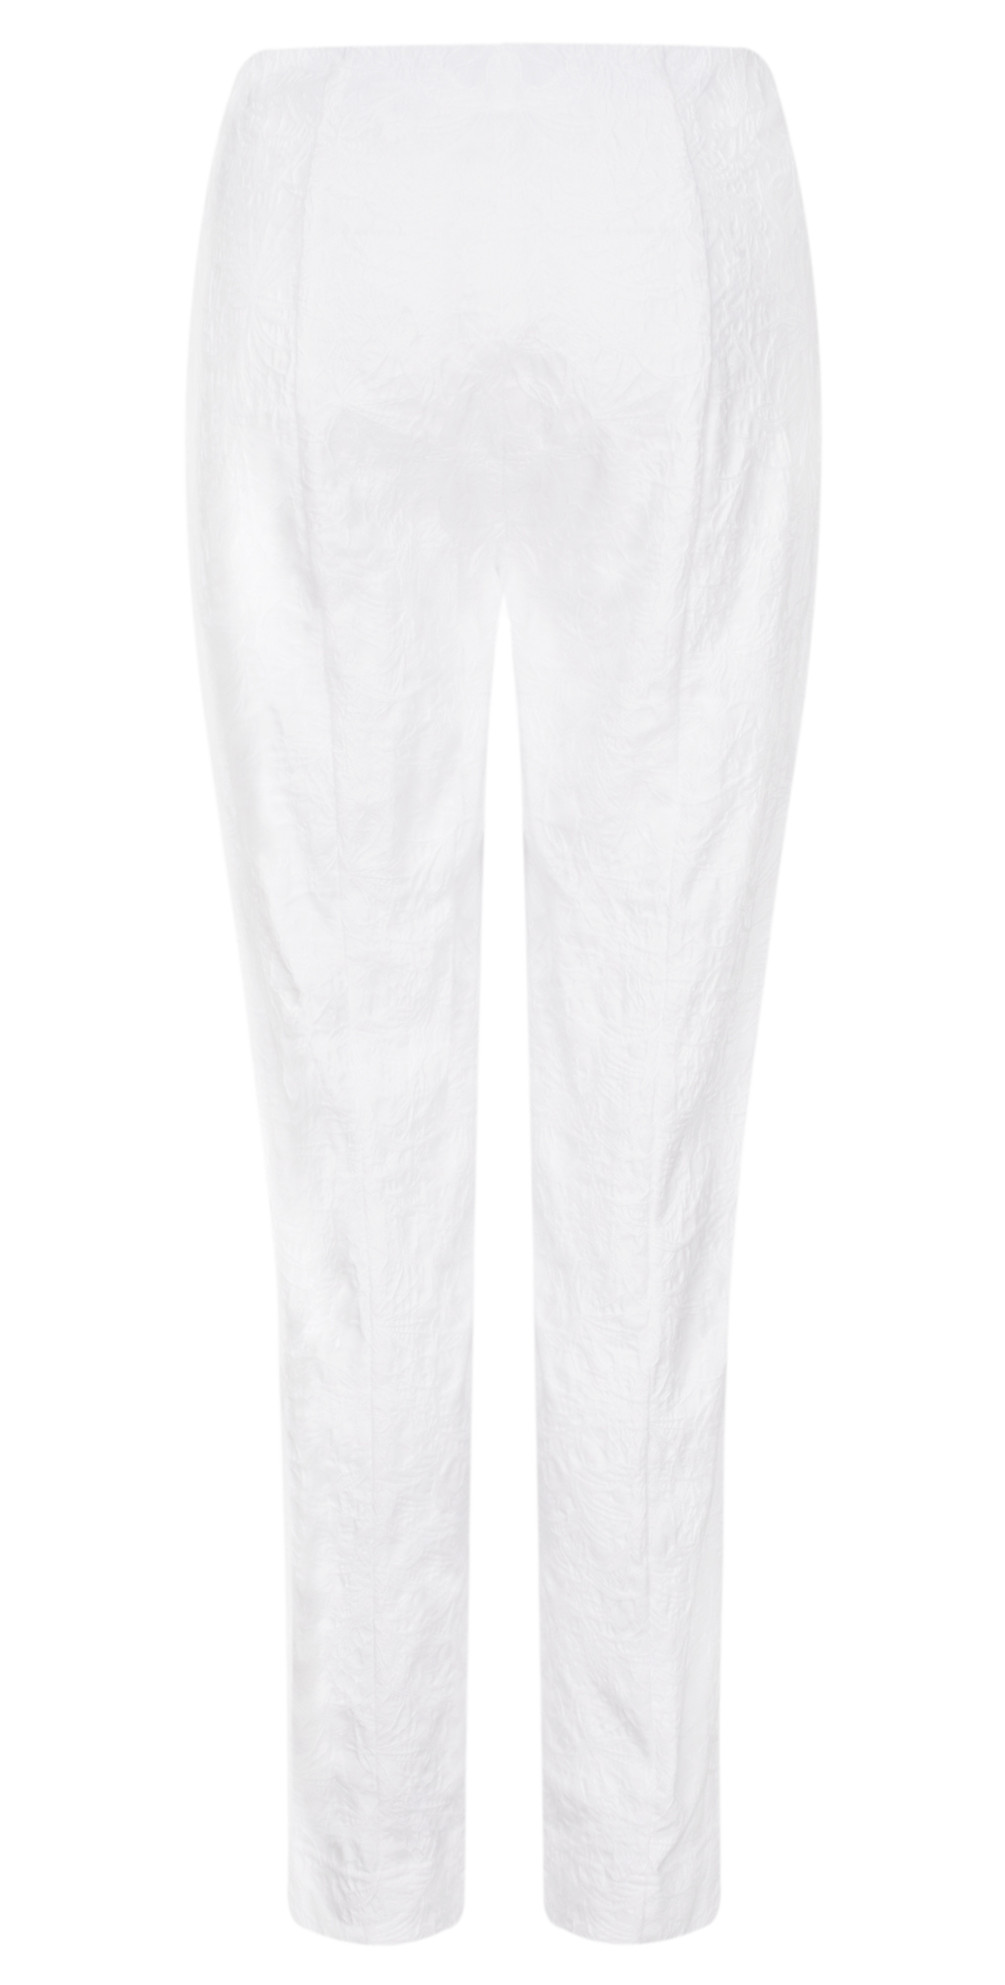 Marie White Flower Jacquard Slim Fit Trouser main image